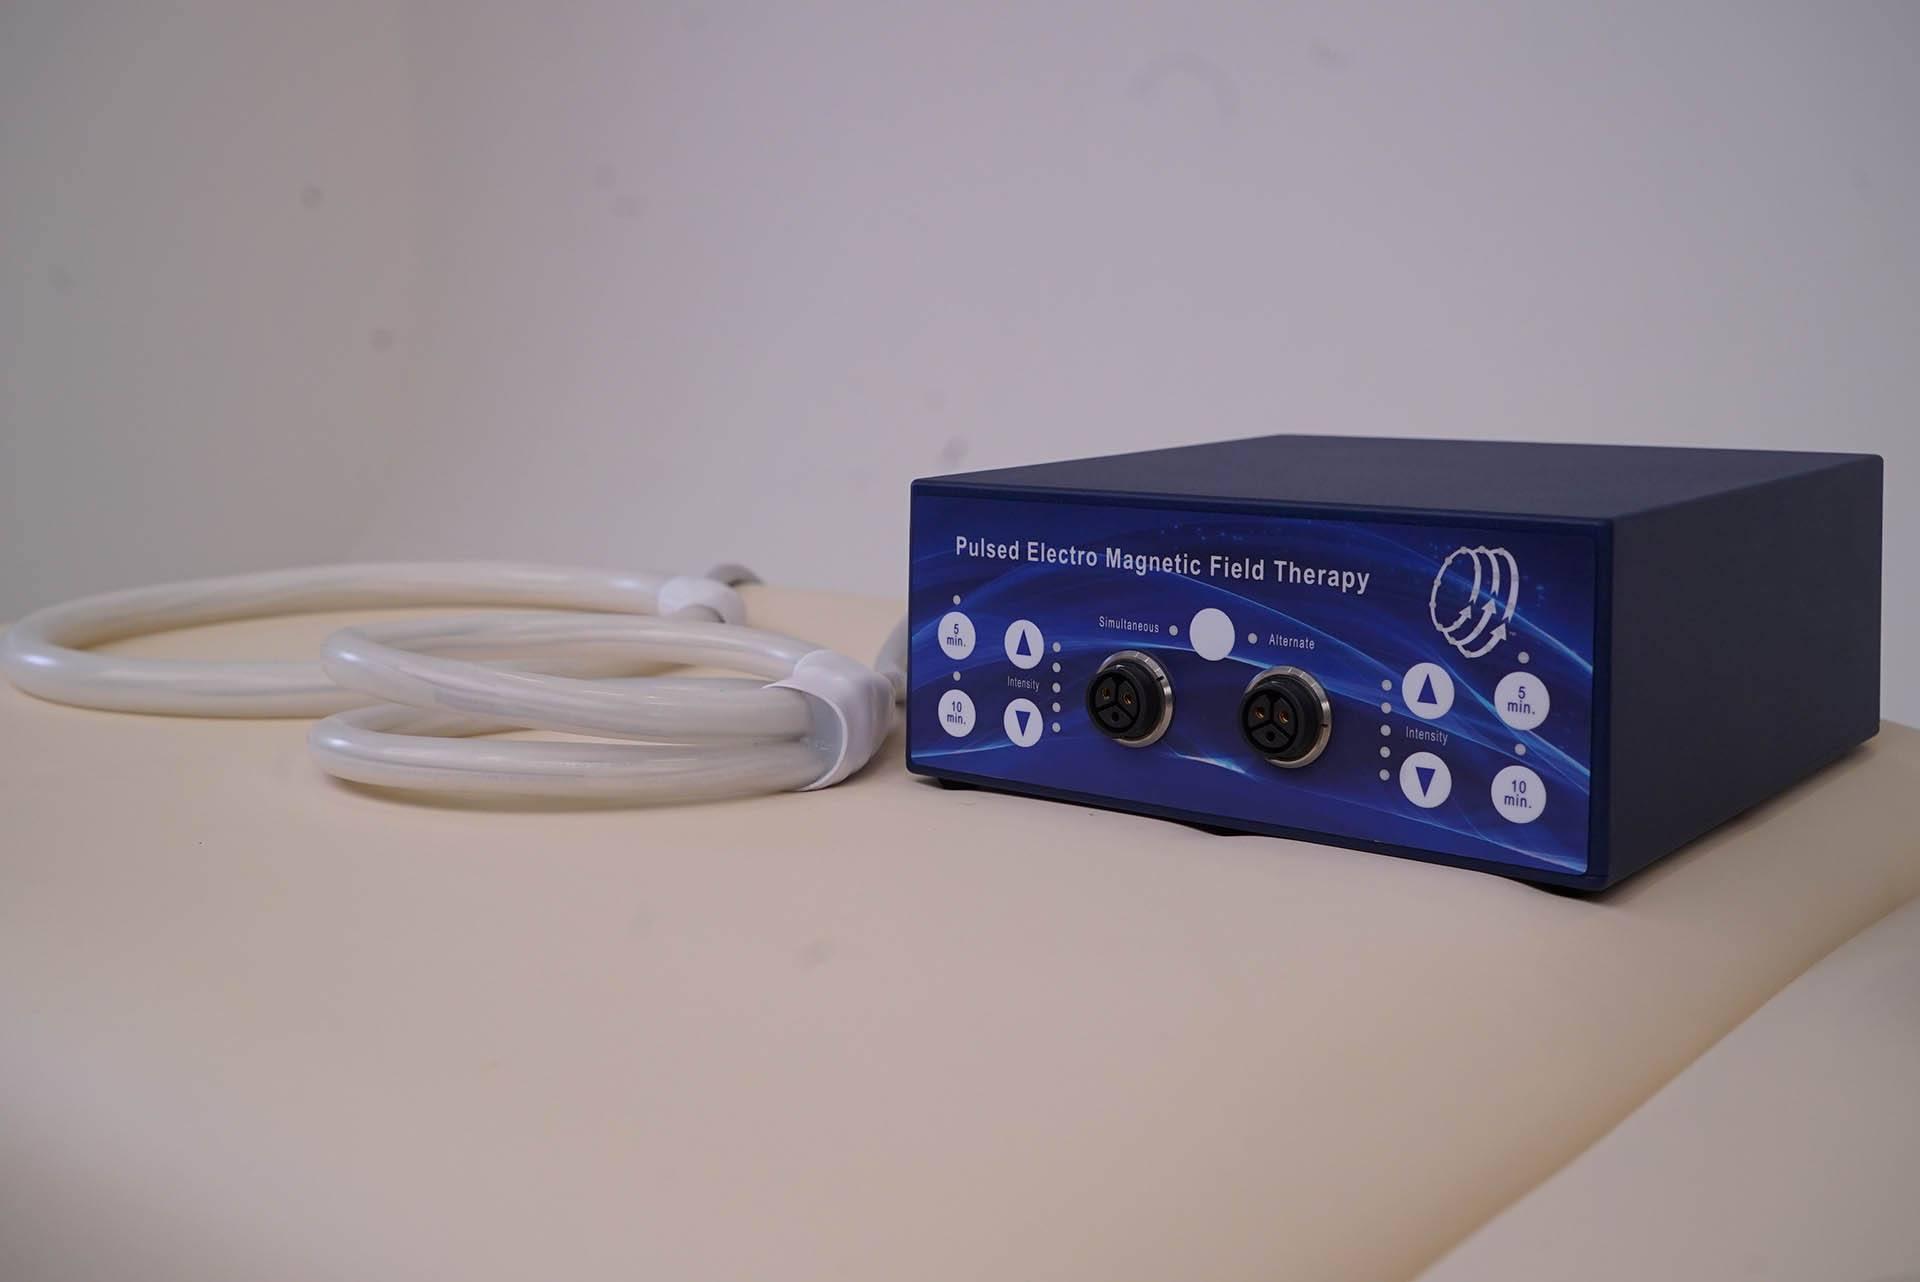 TeslaFit Duo PEMF therapy machine